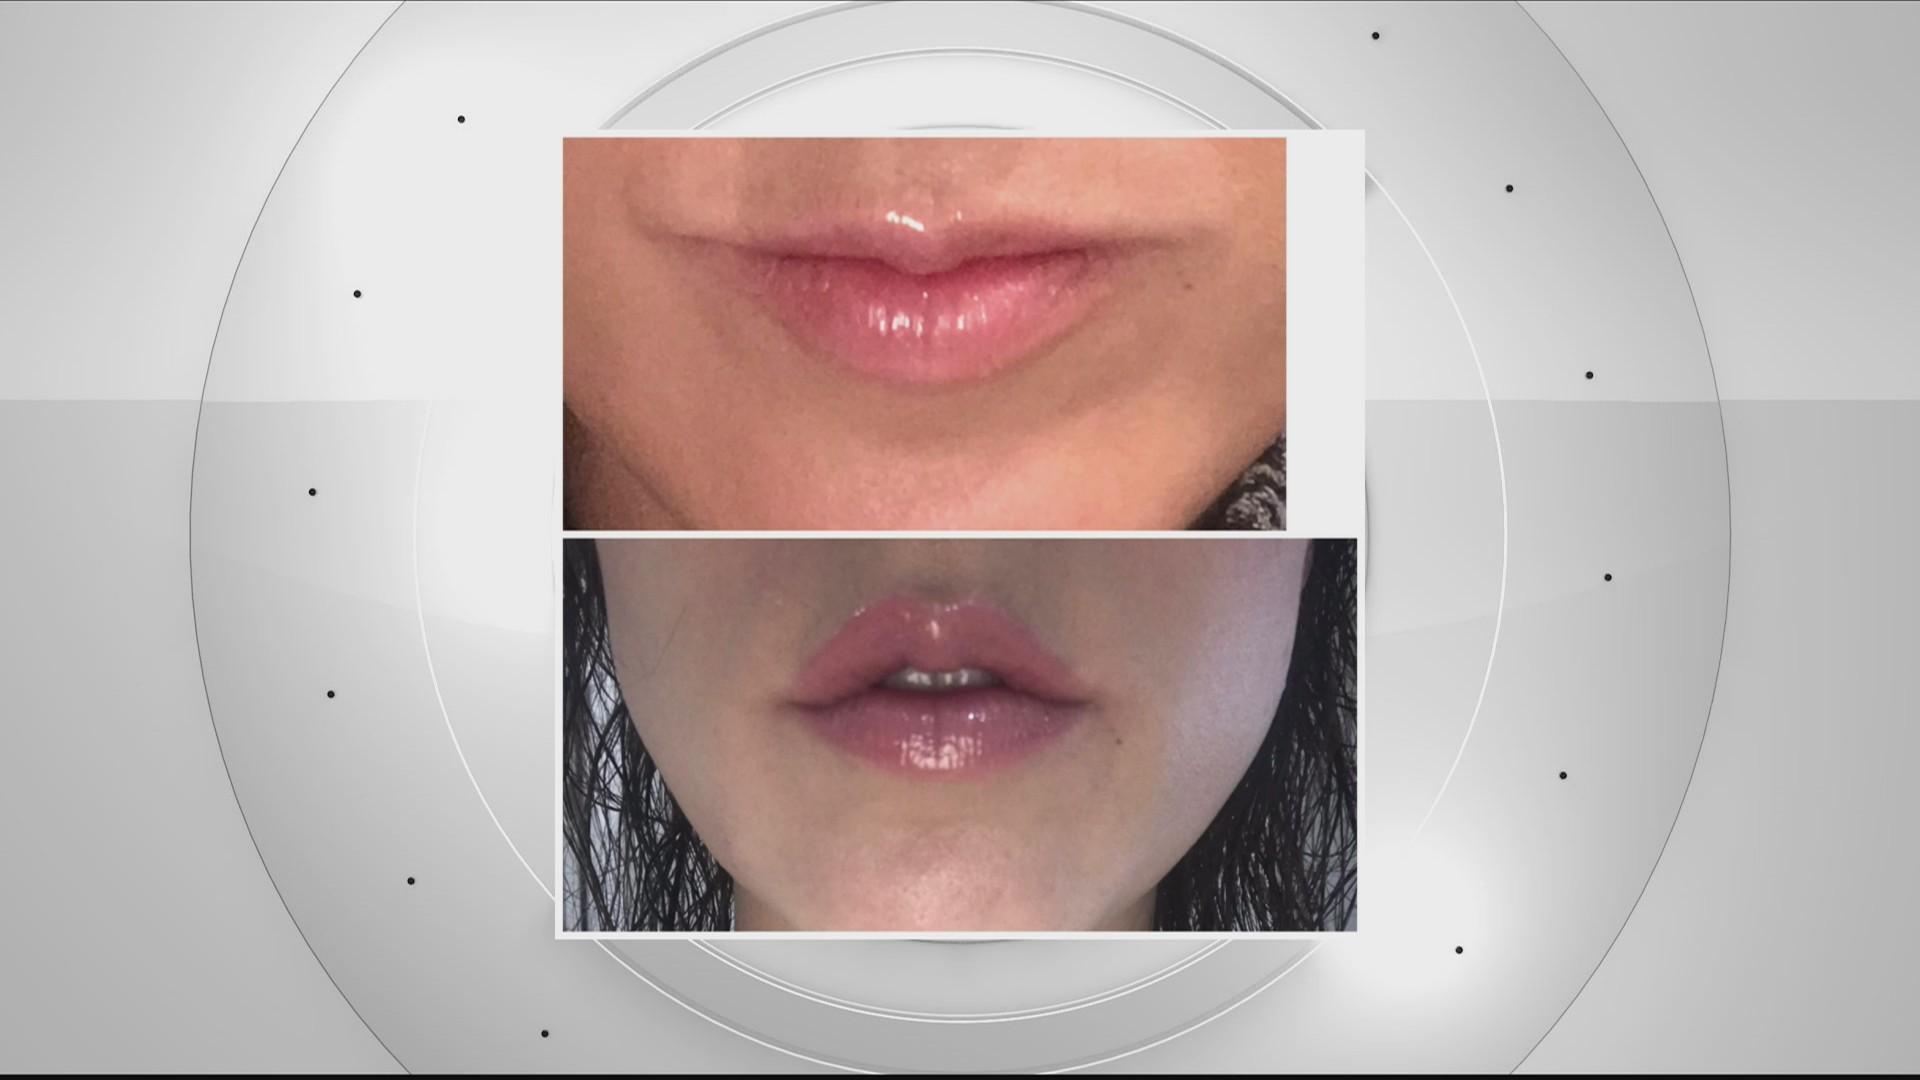 Operate Like A Champion: Lip Filler vs. Lip Flip